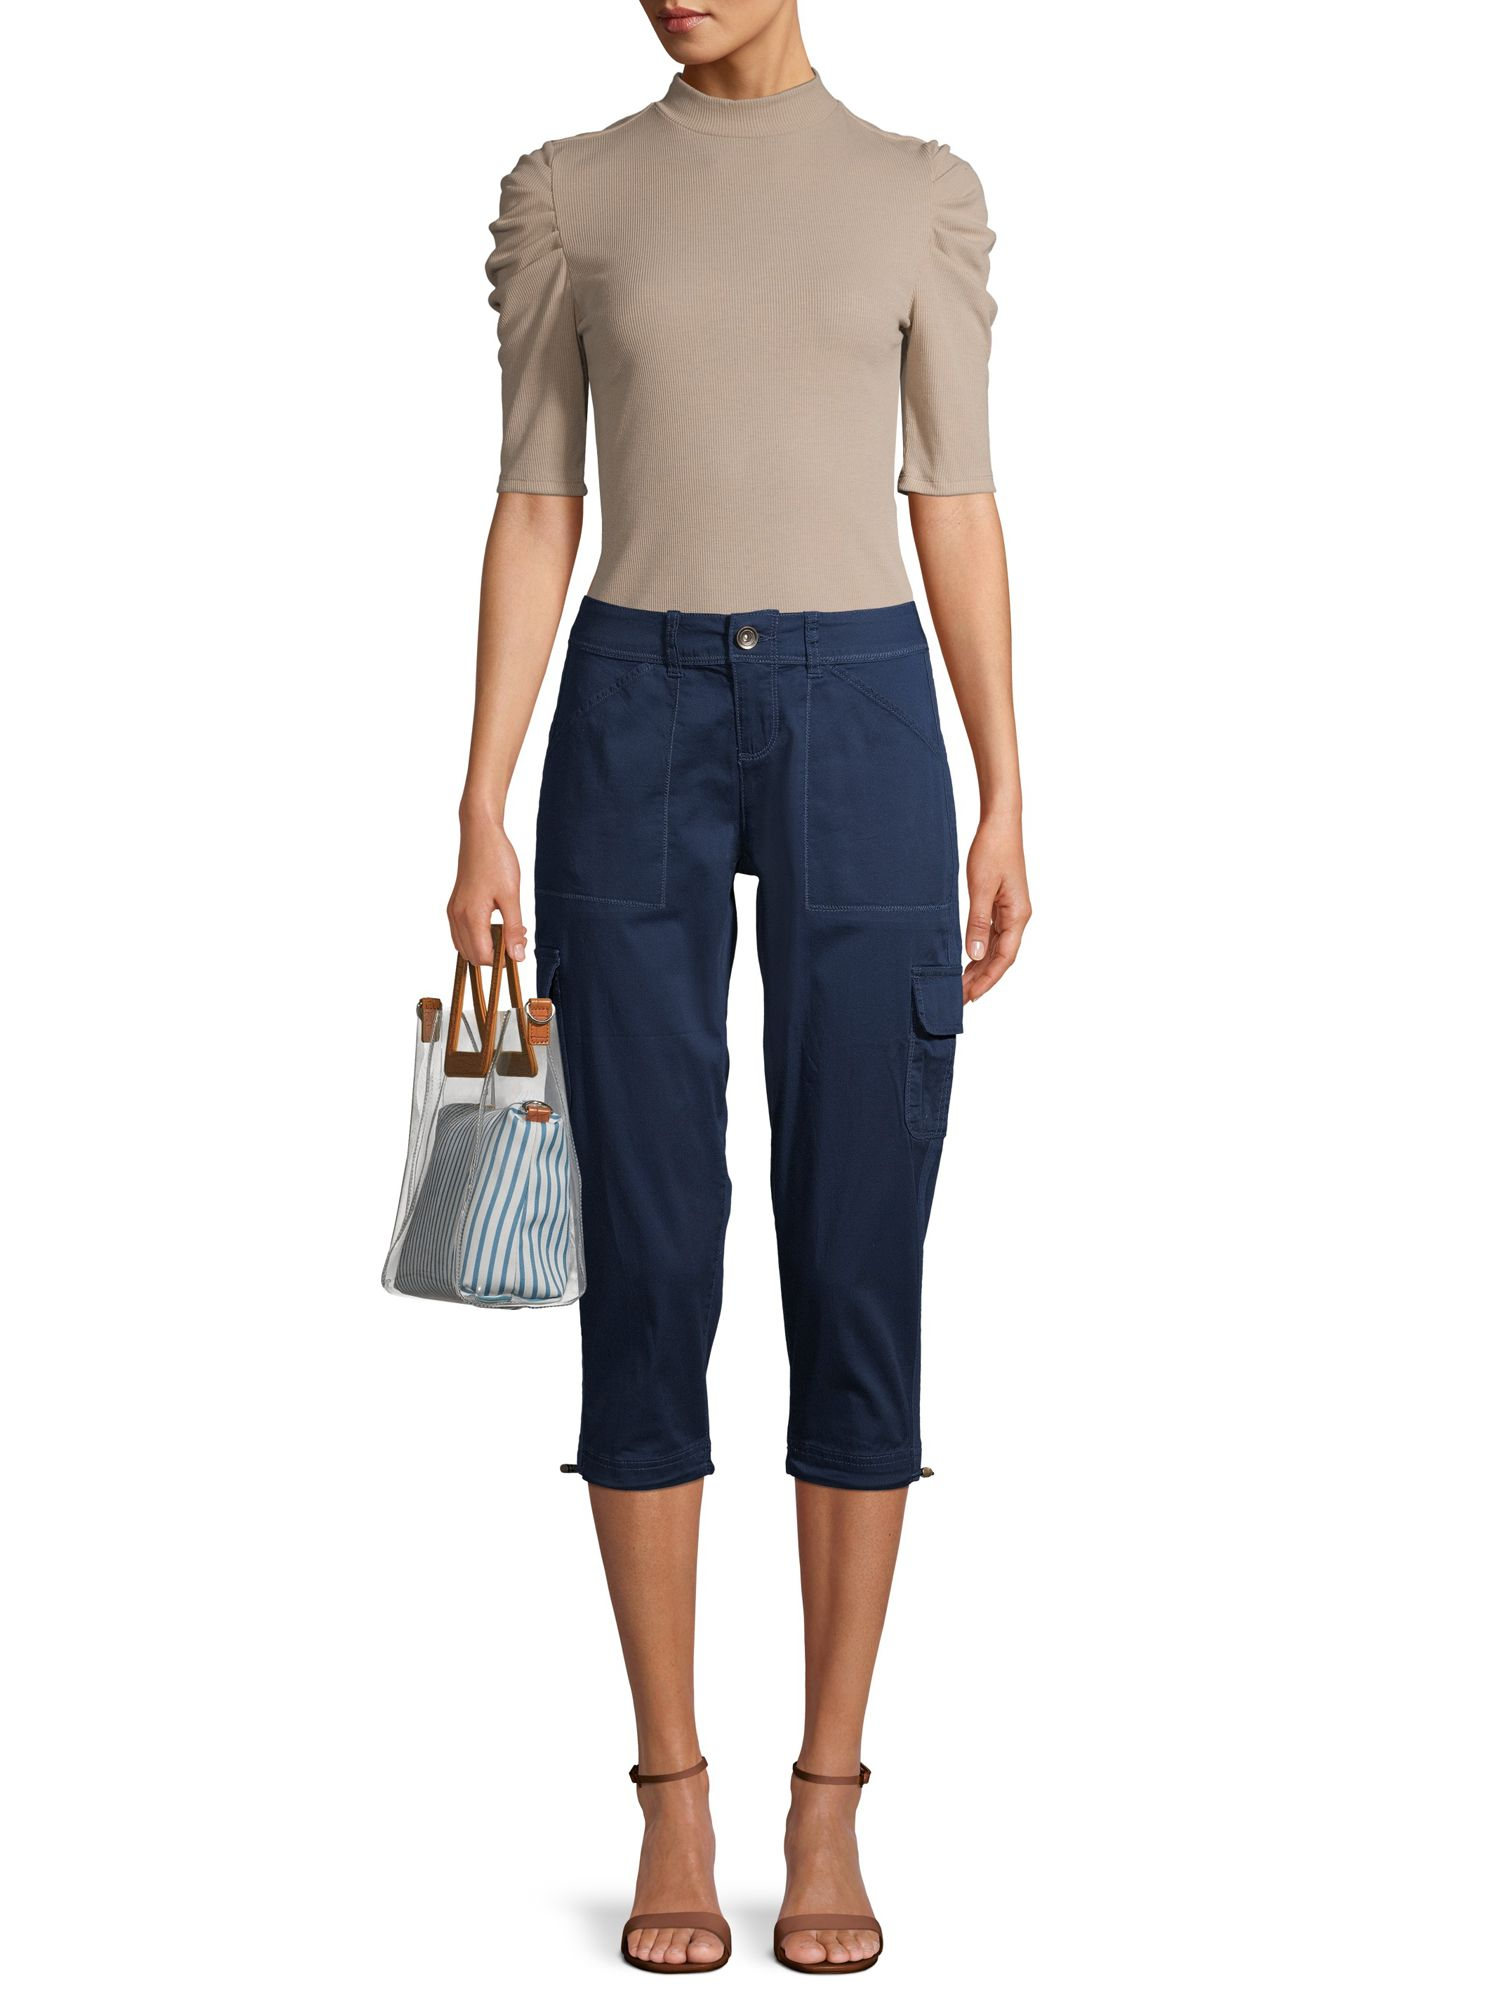 Time And Tru Time And Tru Women S Cargo Capri Pants Walmart Com Womens Cargo Capri Pants Capri Pants Pants [ 2000 x 1500 Pixel ]